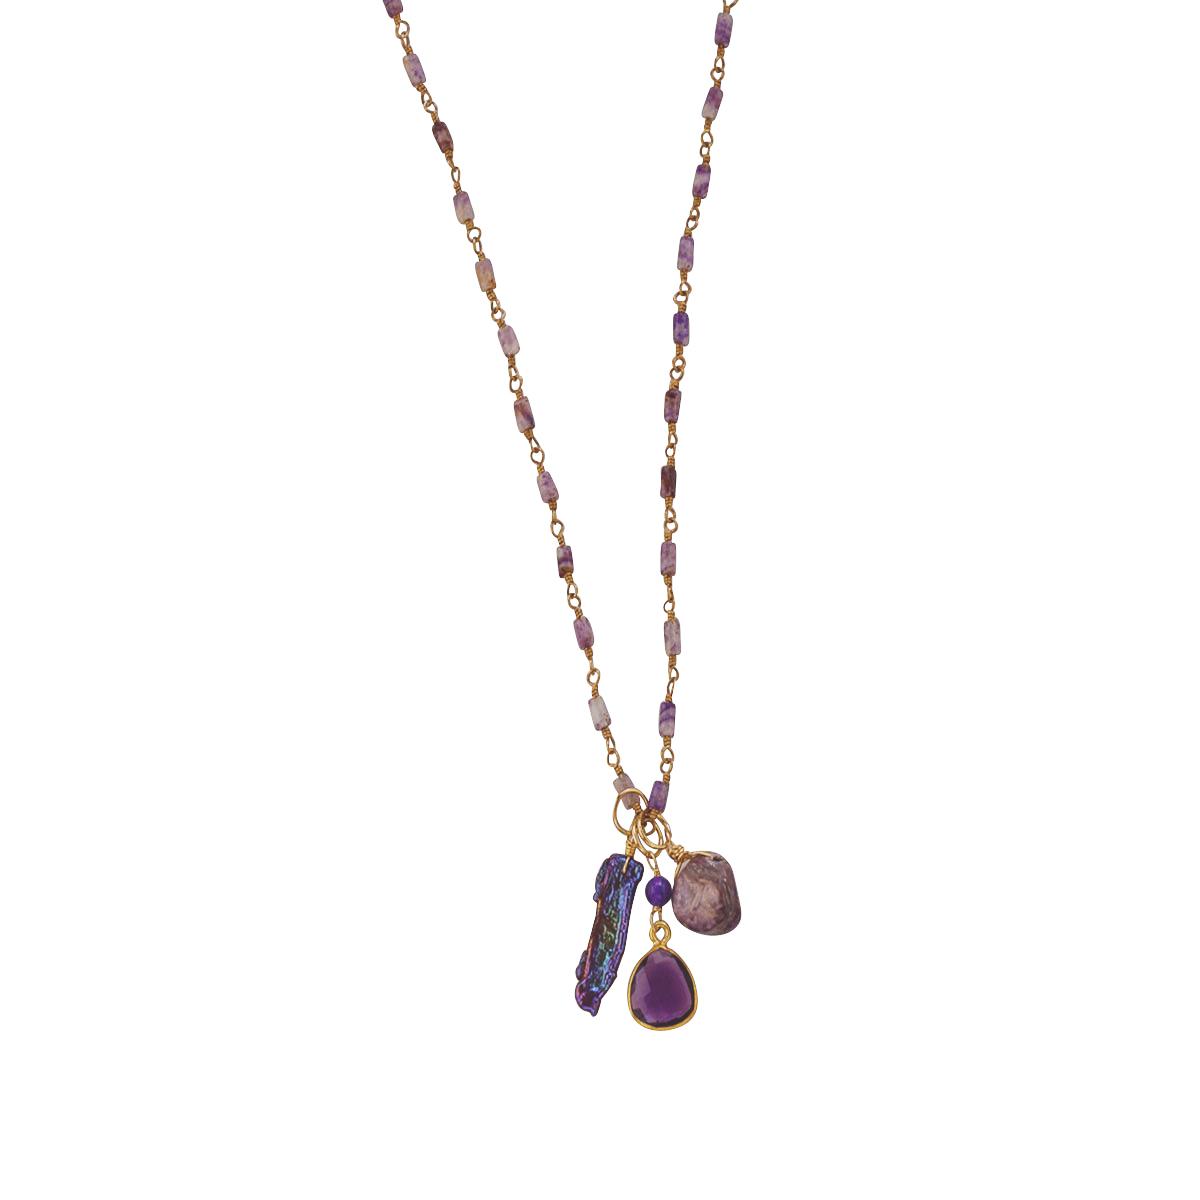 Sugilige Boho Necklace Amethyst & Pearl